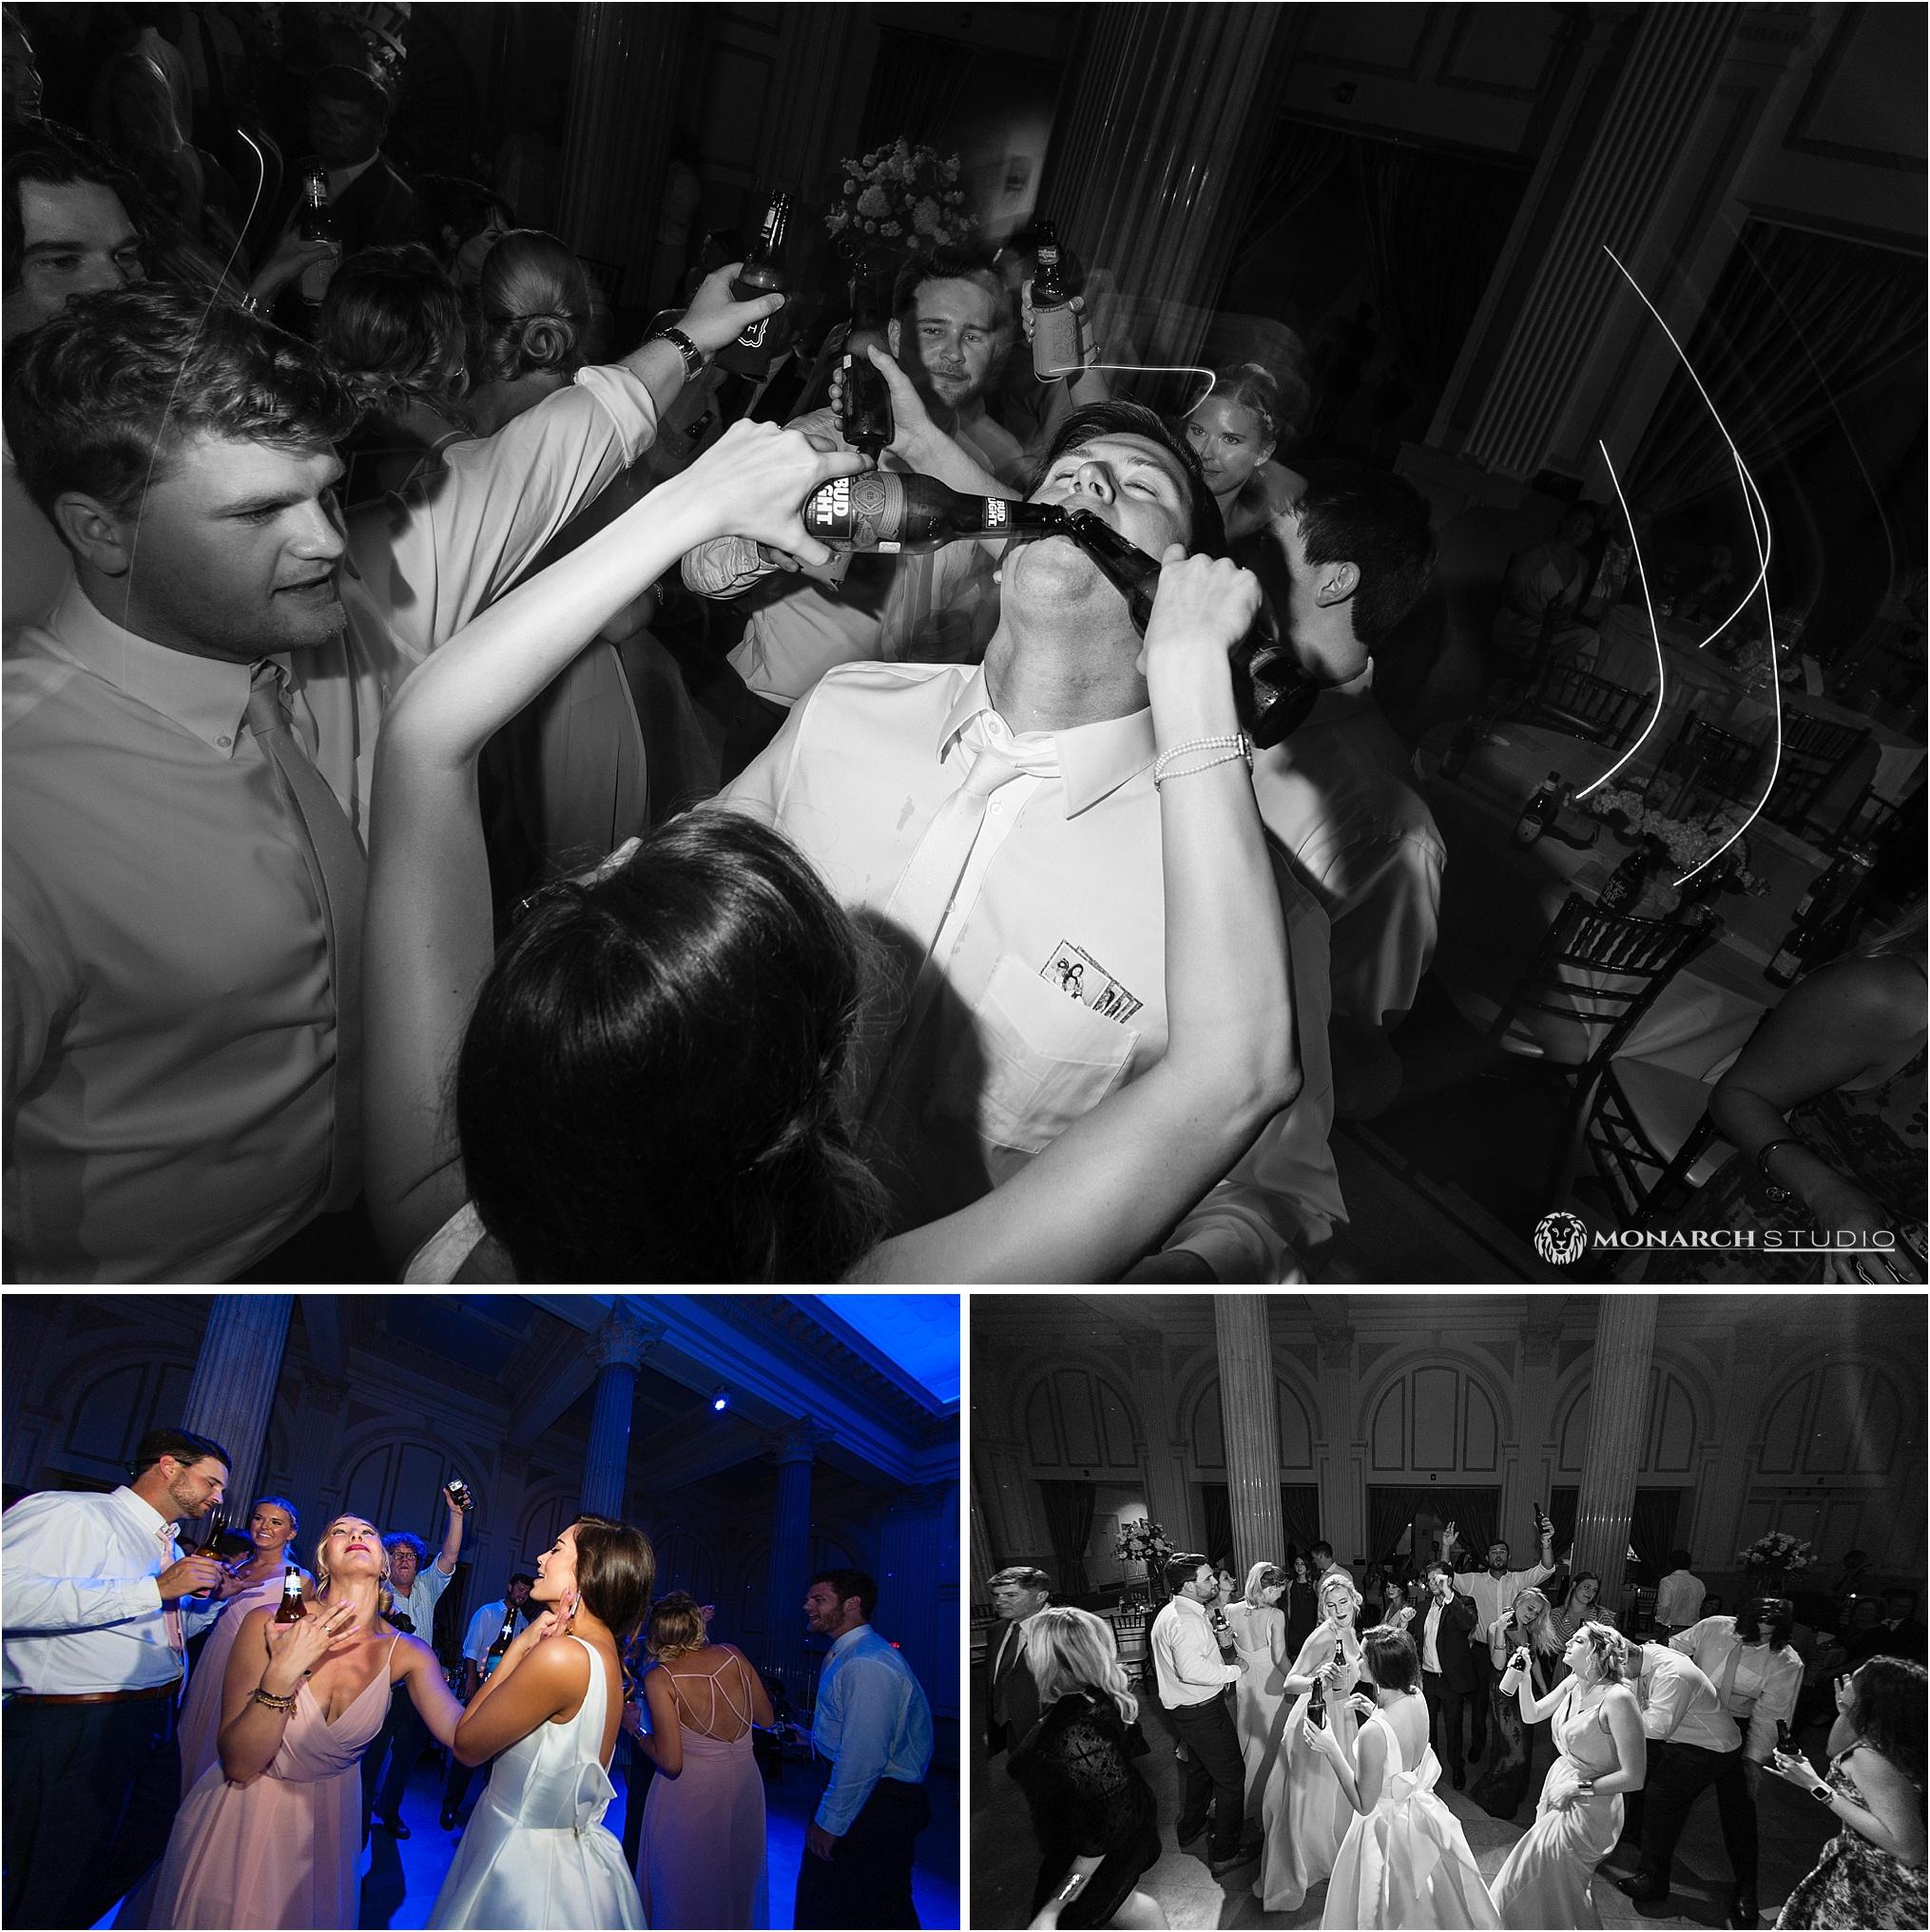 st-augustine-wedding-photographer-151.jpg